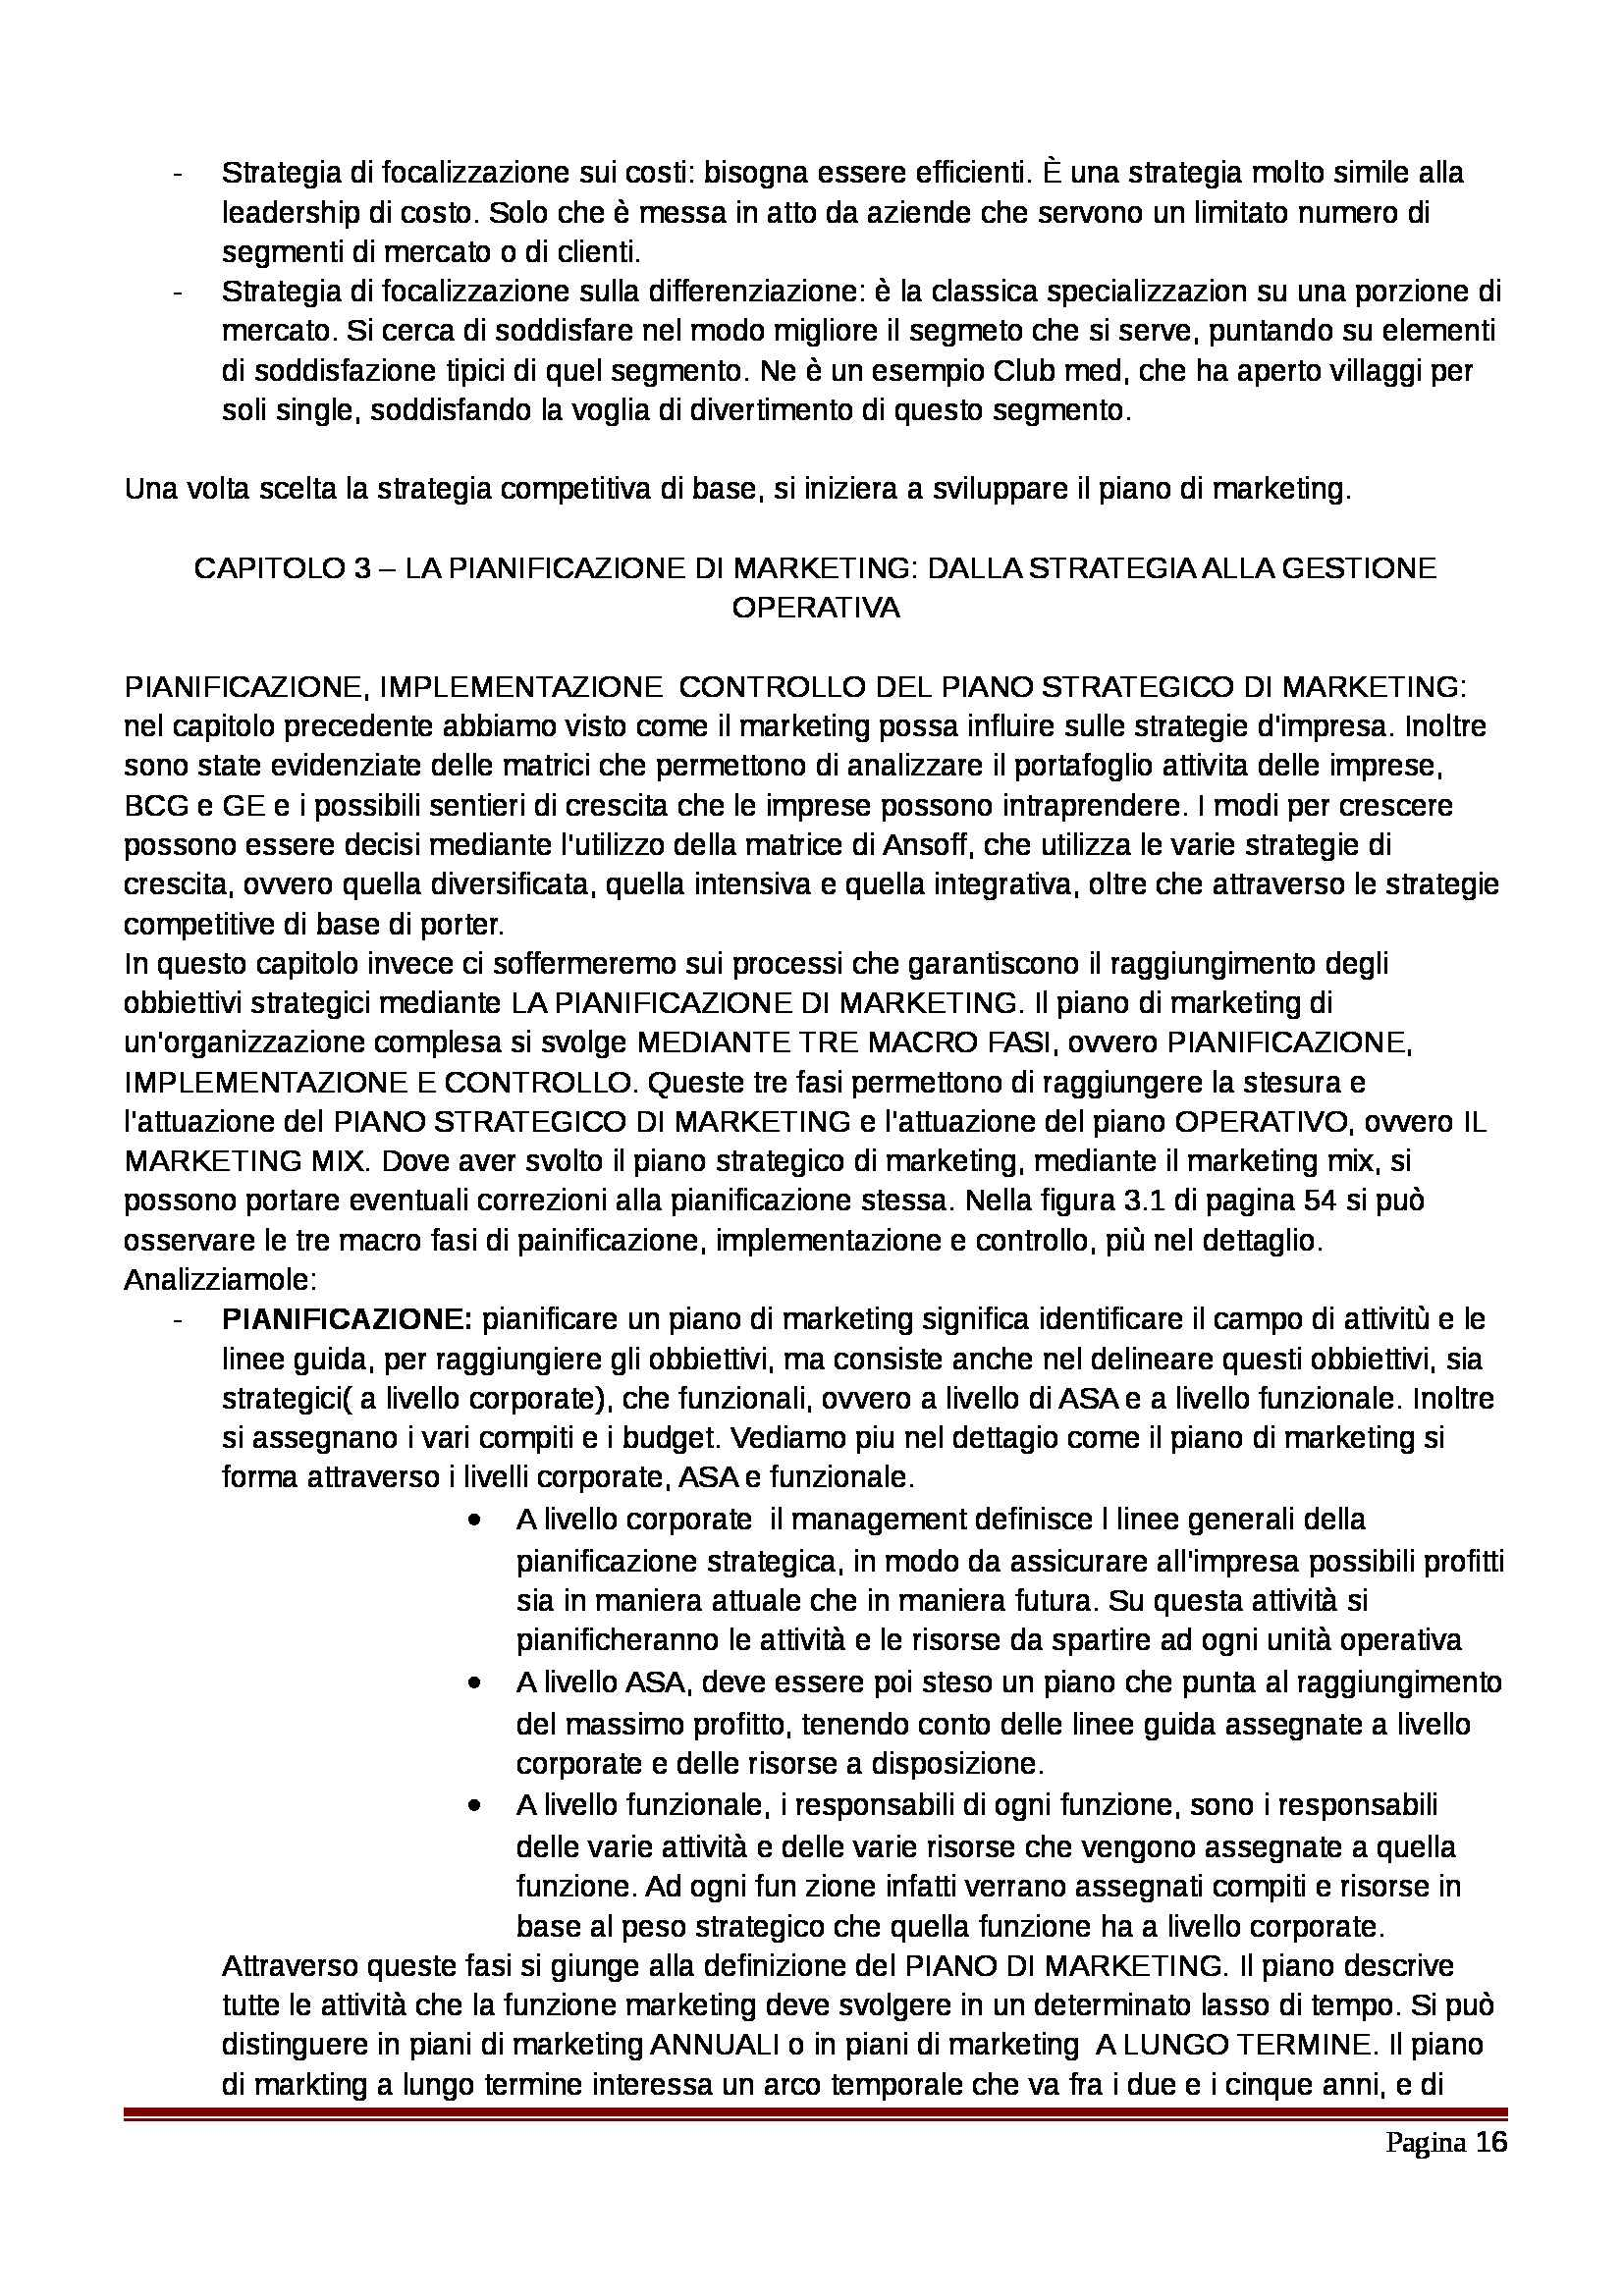 Riassunto esame Marketing, prof. Pellegrini, libro consigliato Marketing, Kerin, Hartley, Rudelius, Pellegrini Pag. 16